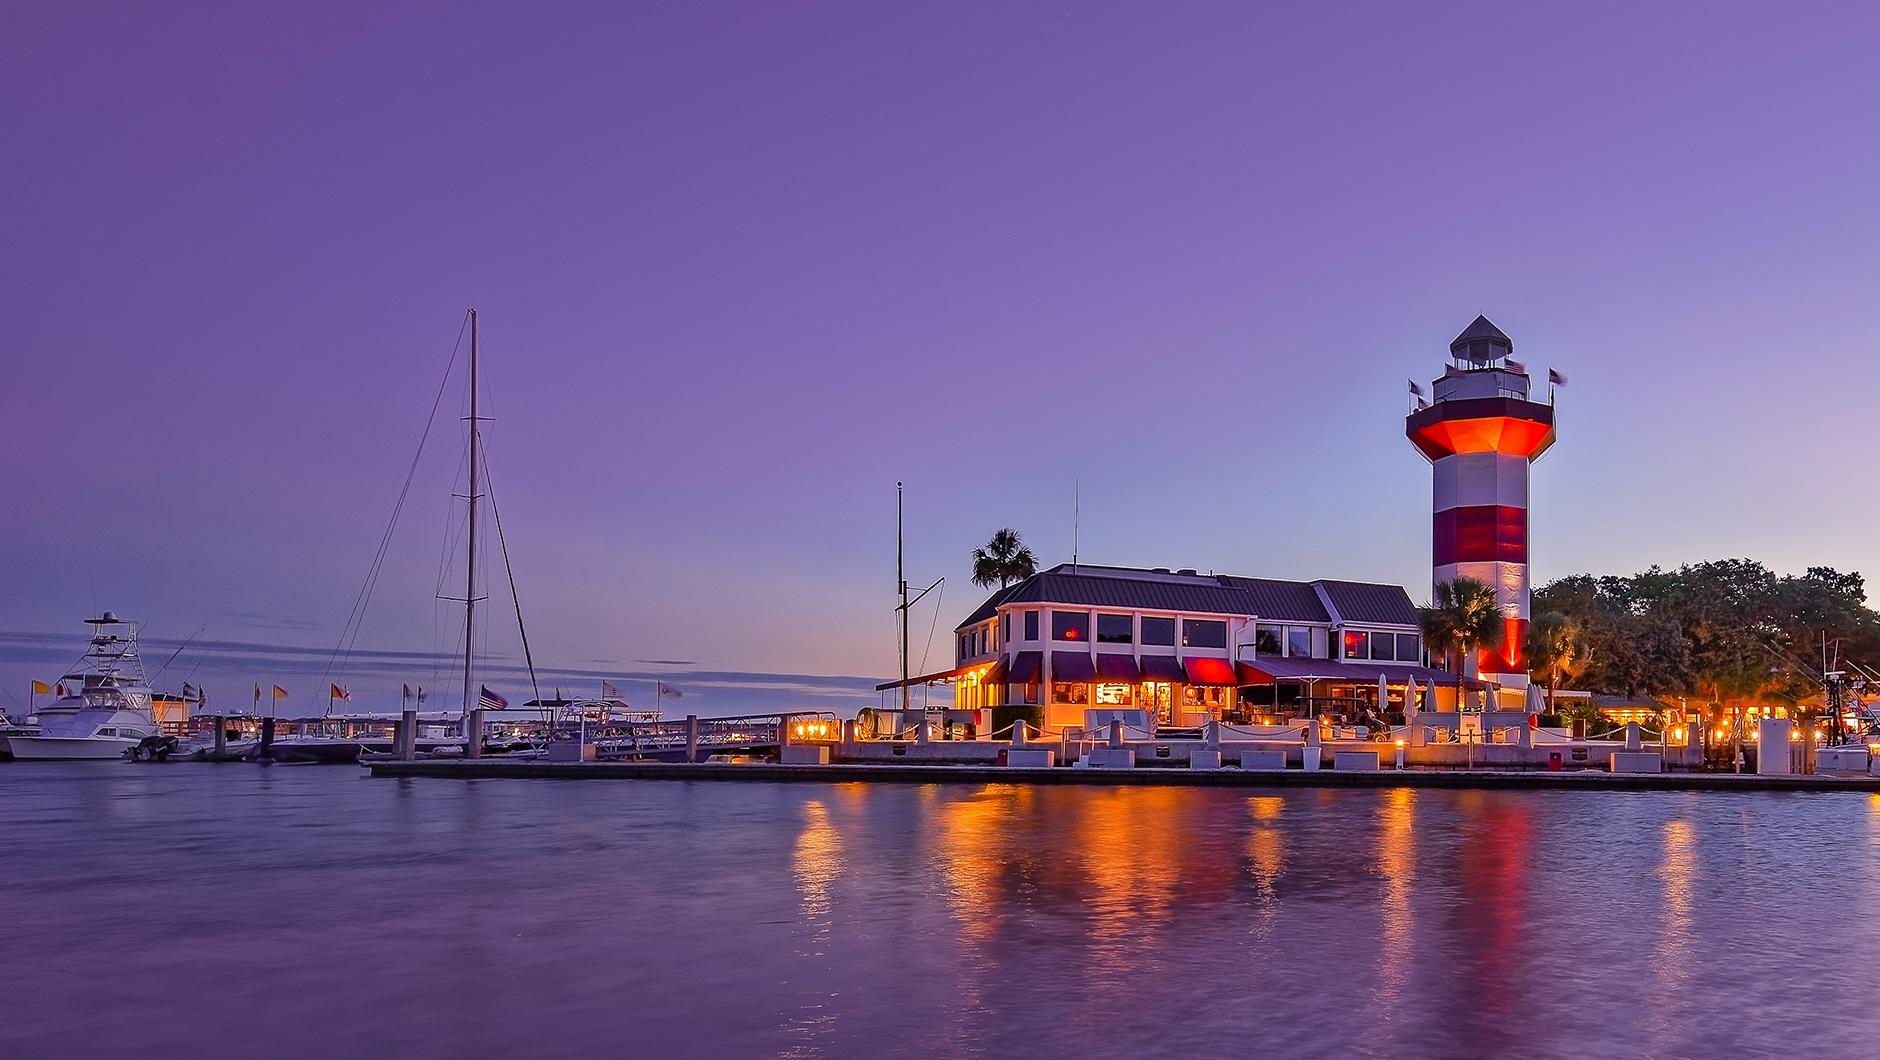 Seapines lighthouse in  Hilton Head